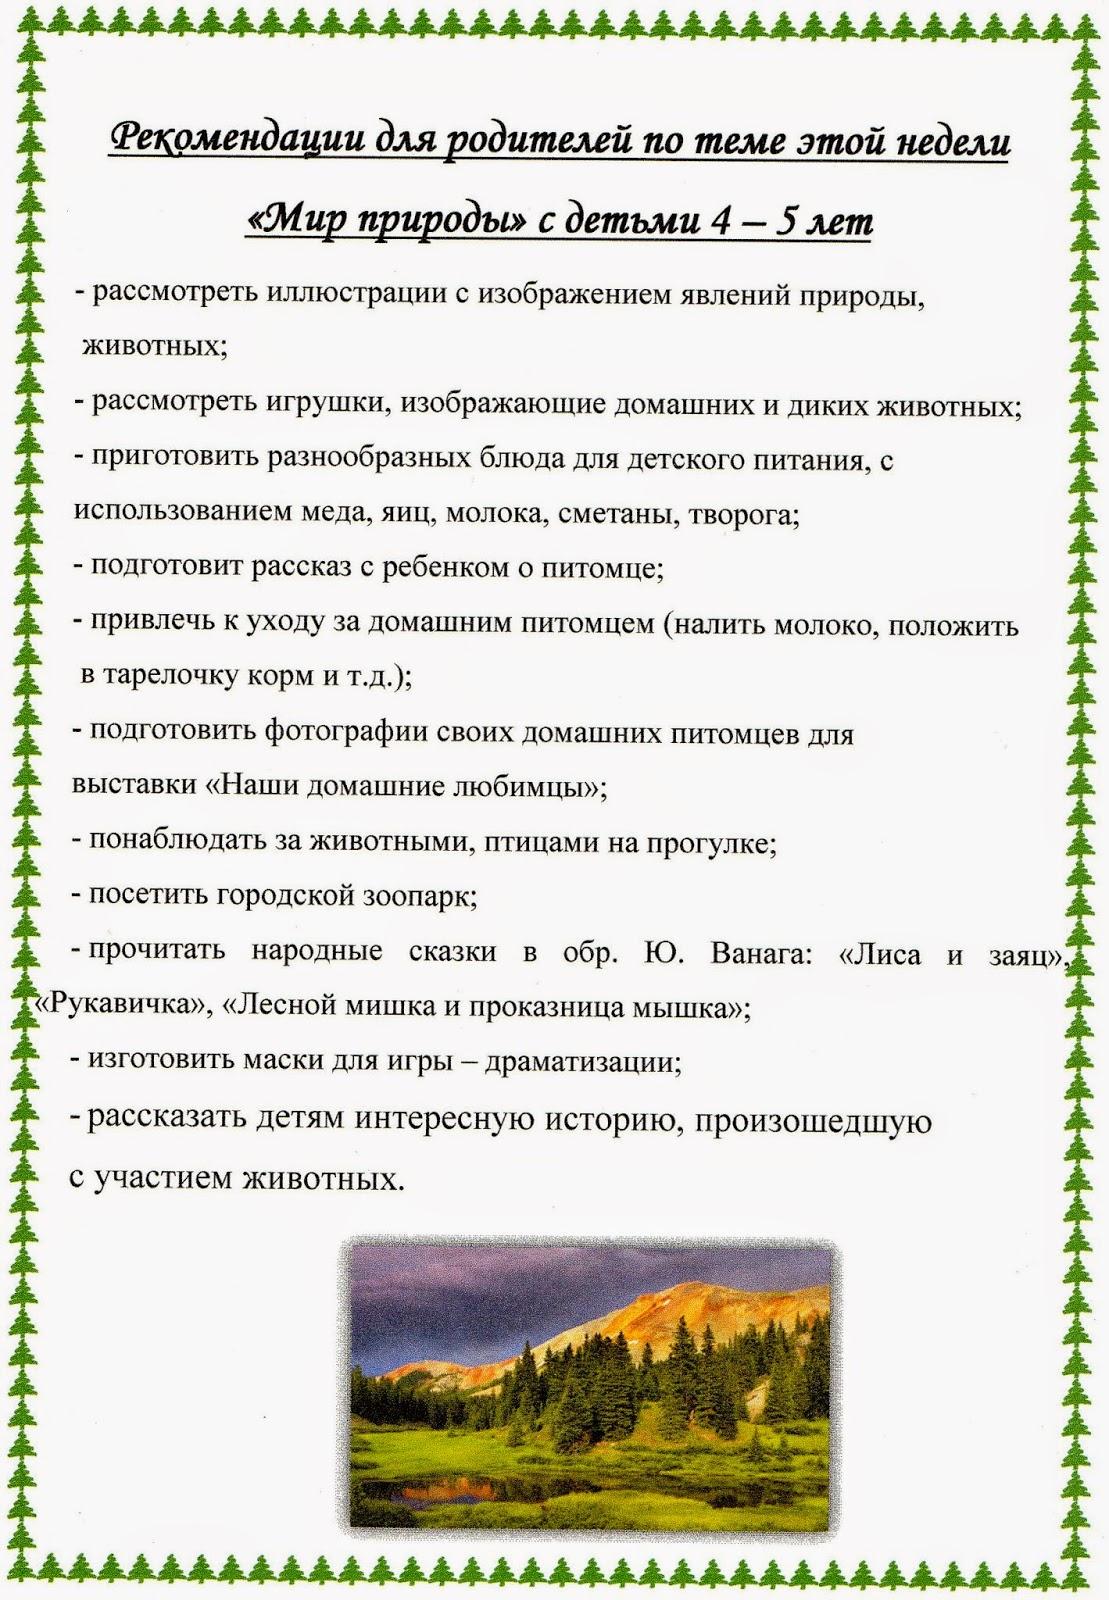 Картинки по теме мир природы